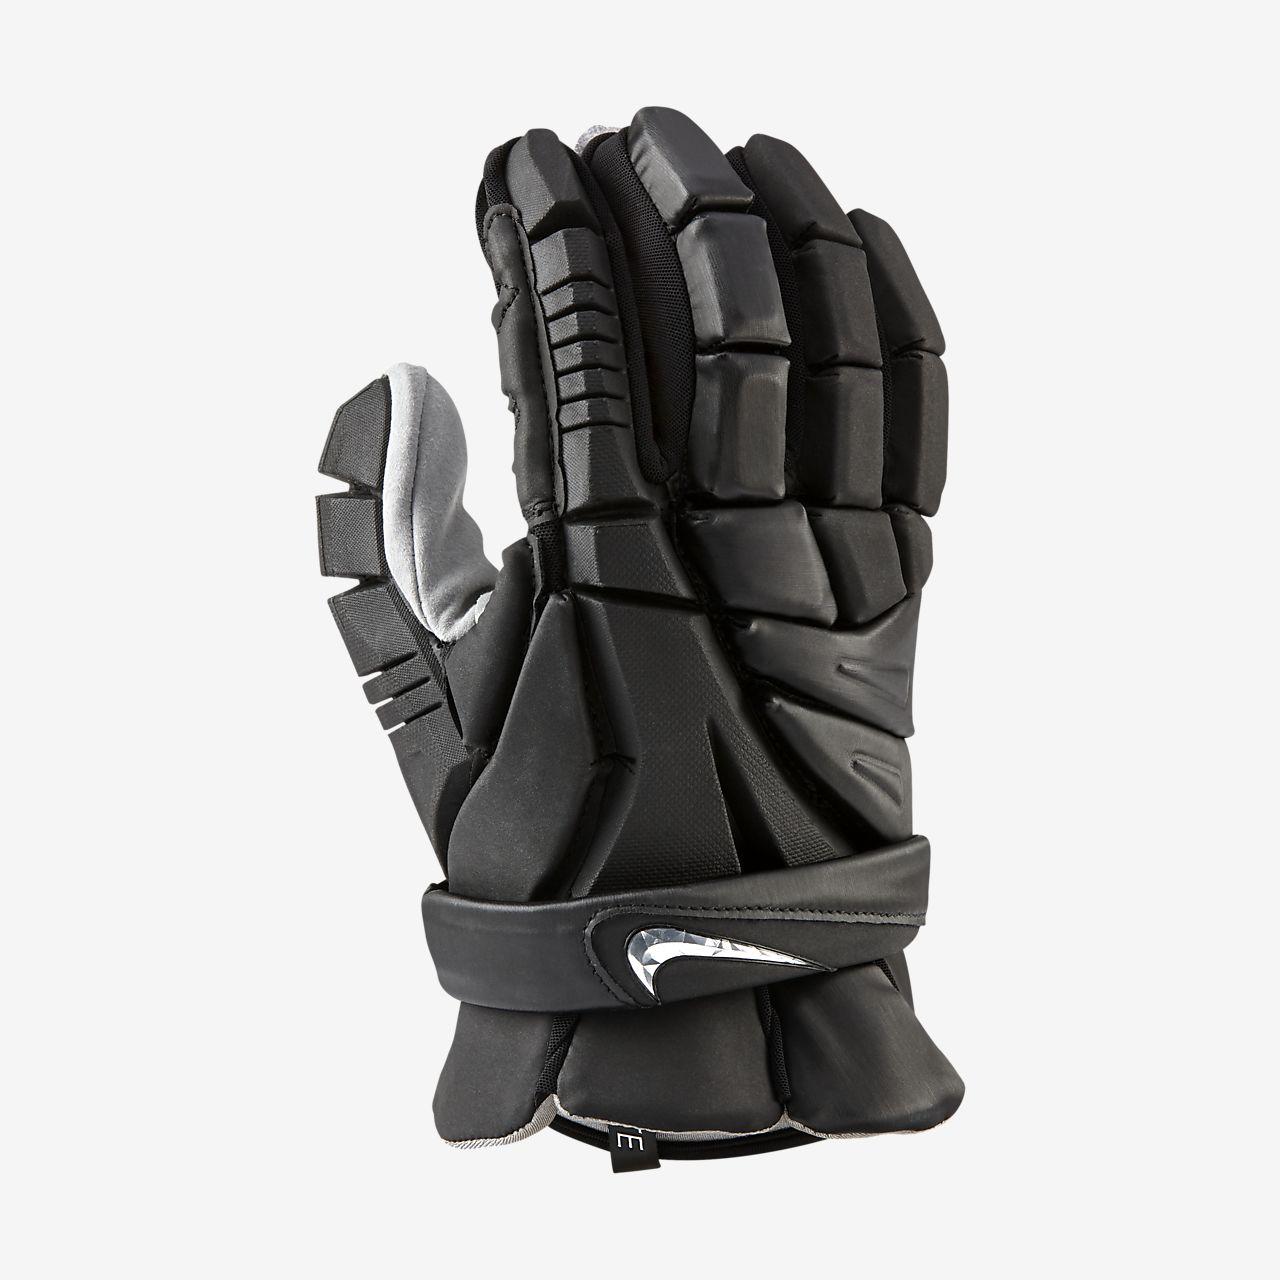 15736005fa4f Nike Vapor Elite Men s Lacrosse Gloves. Nike.com